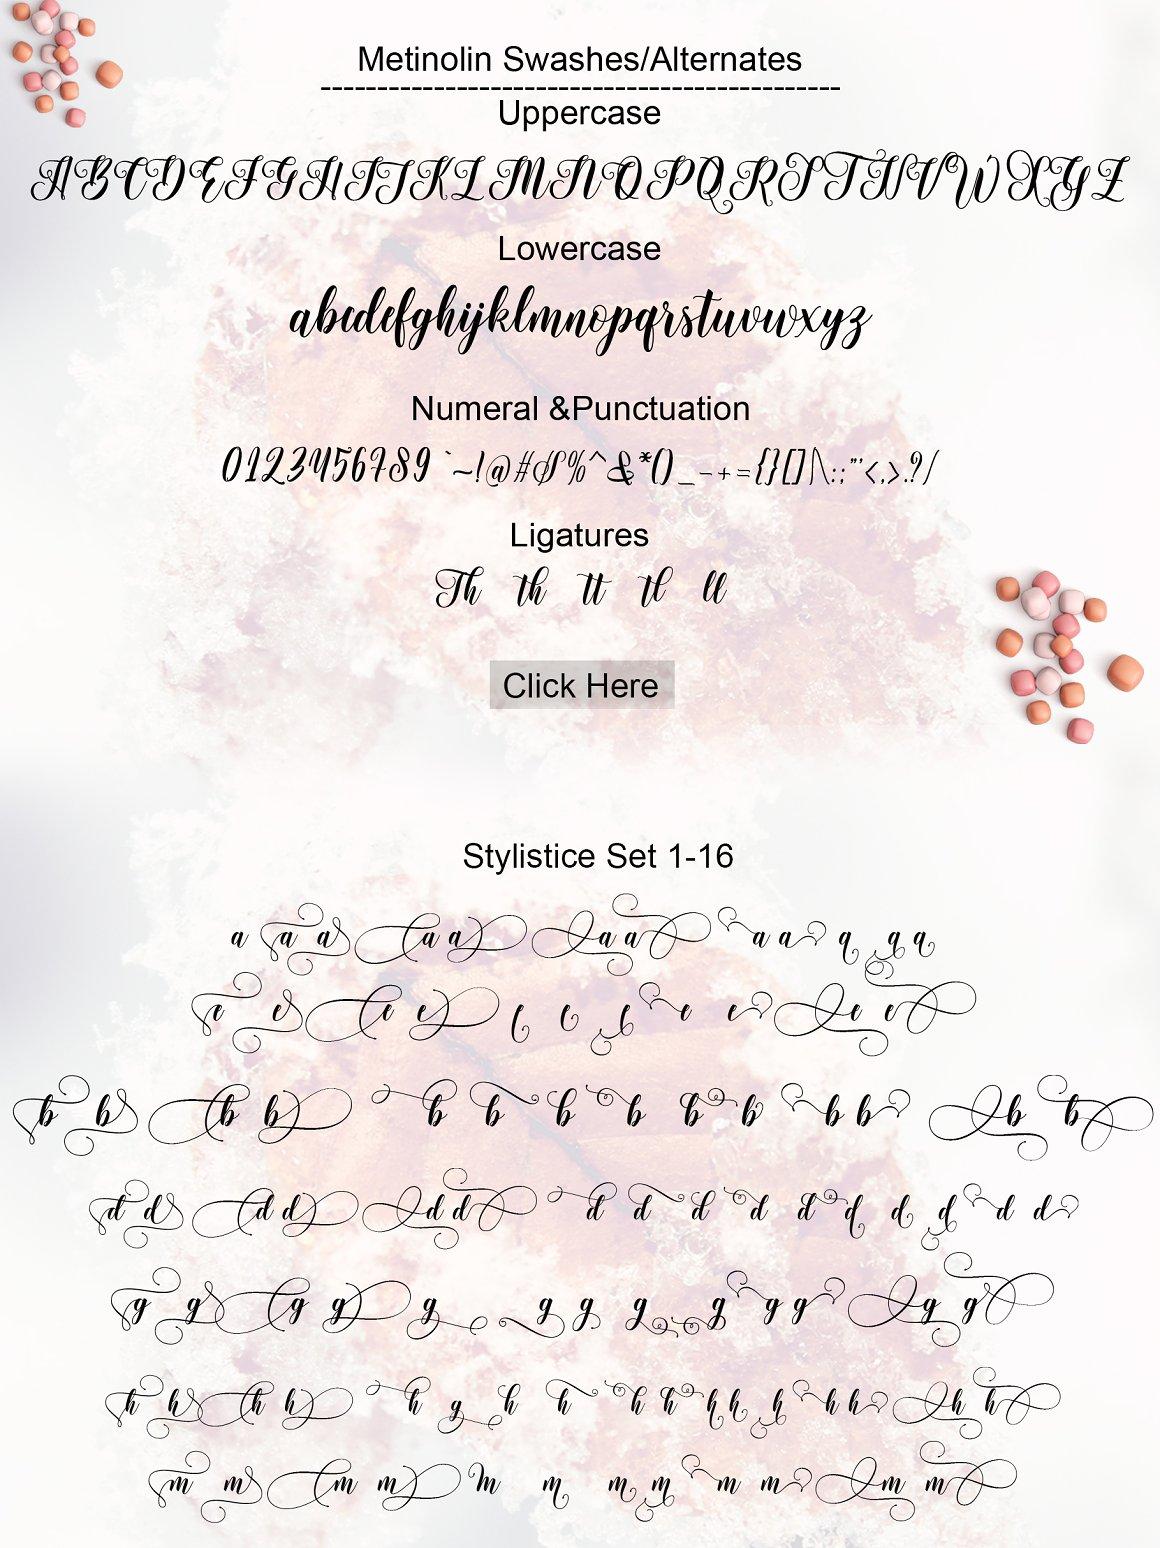 Metinoline Modern Calligraphy Typeface -3